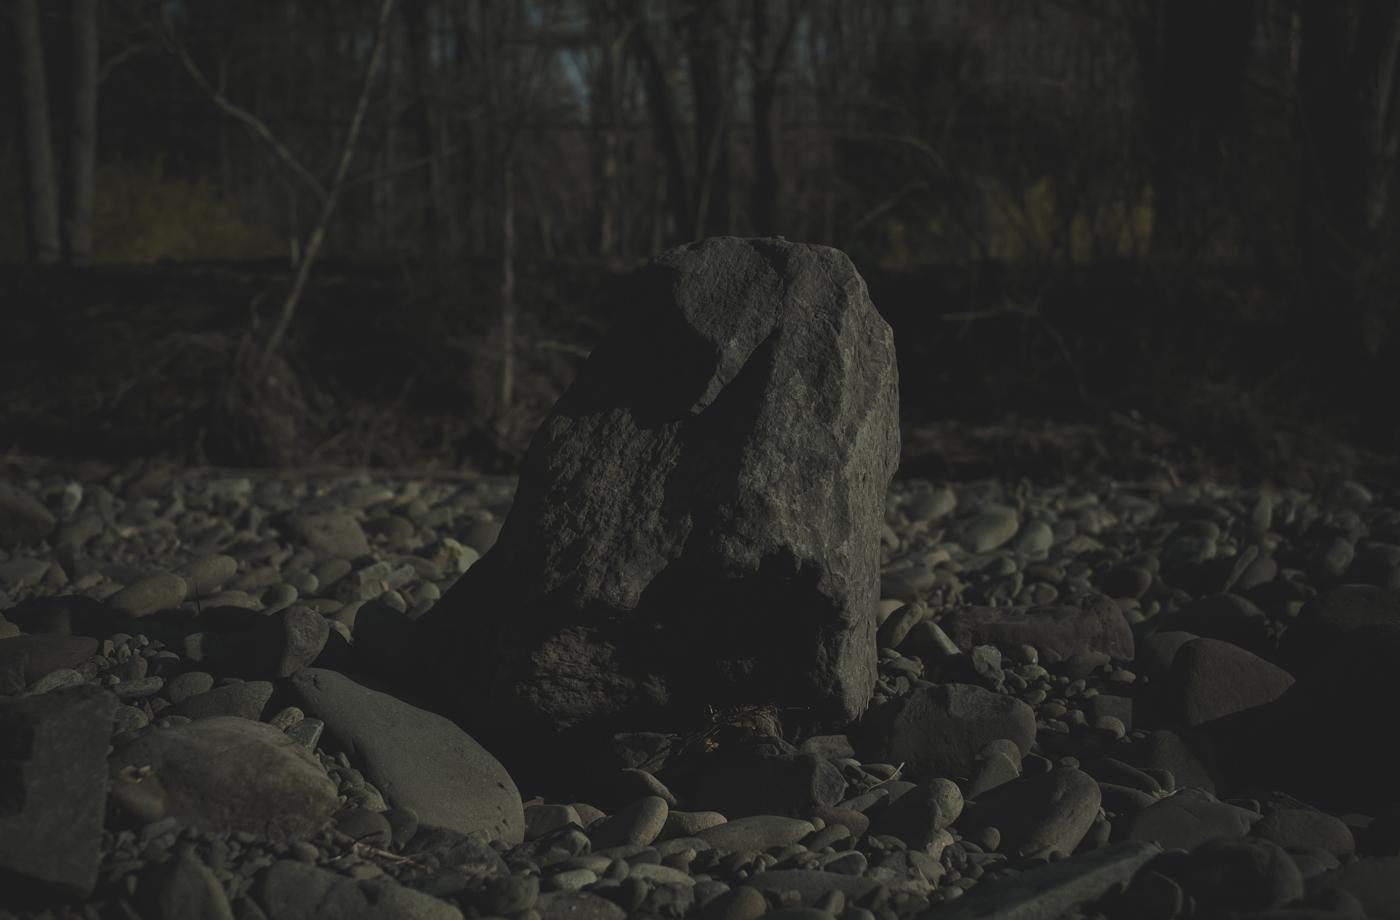 Moonlit 3